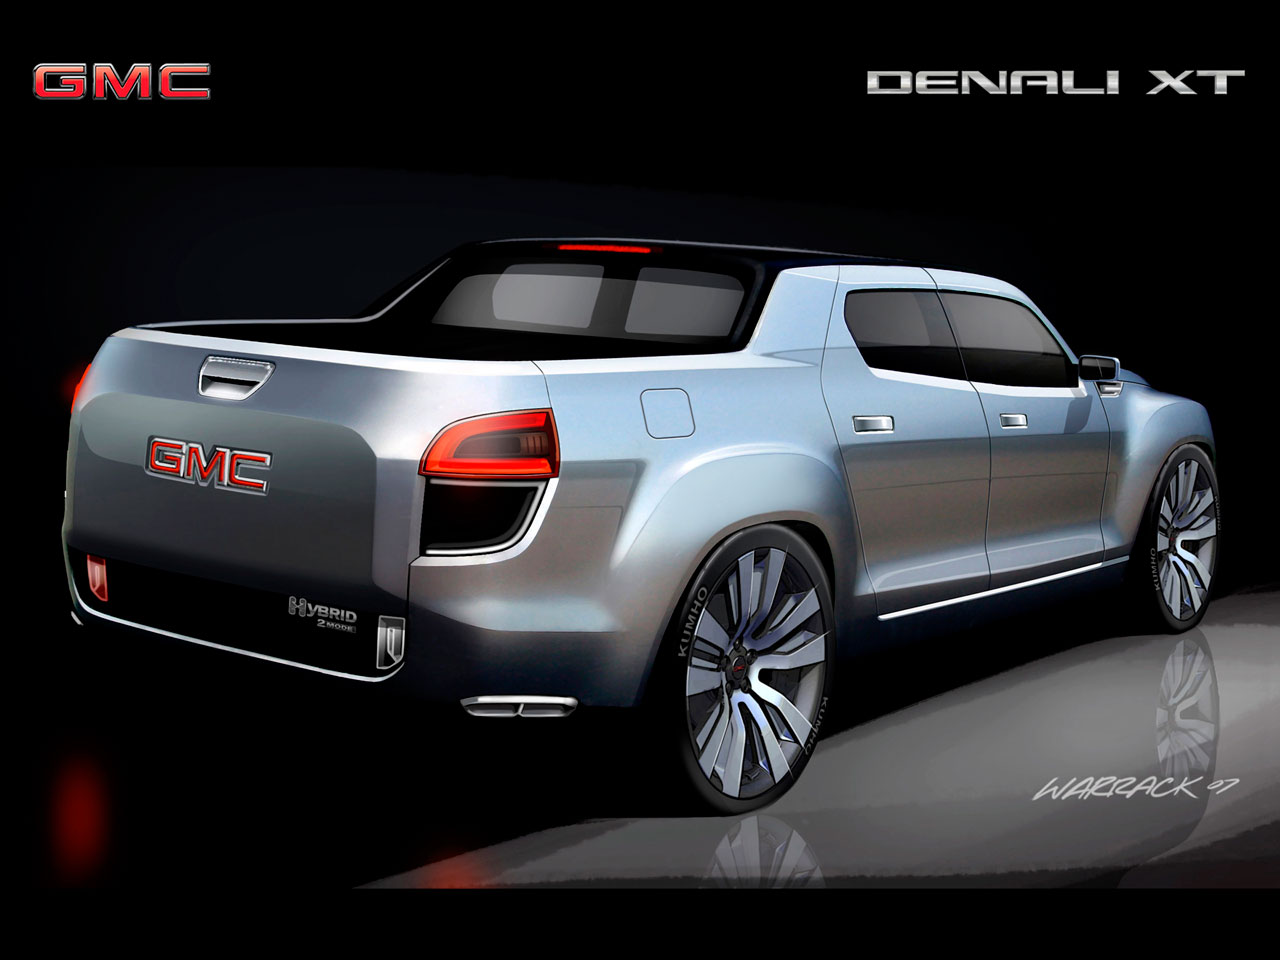 Gmc Denali Xt Concept Rendering